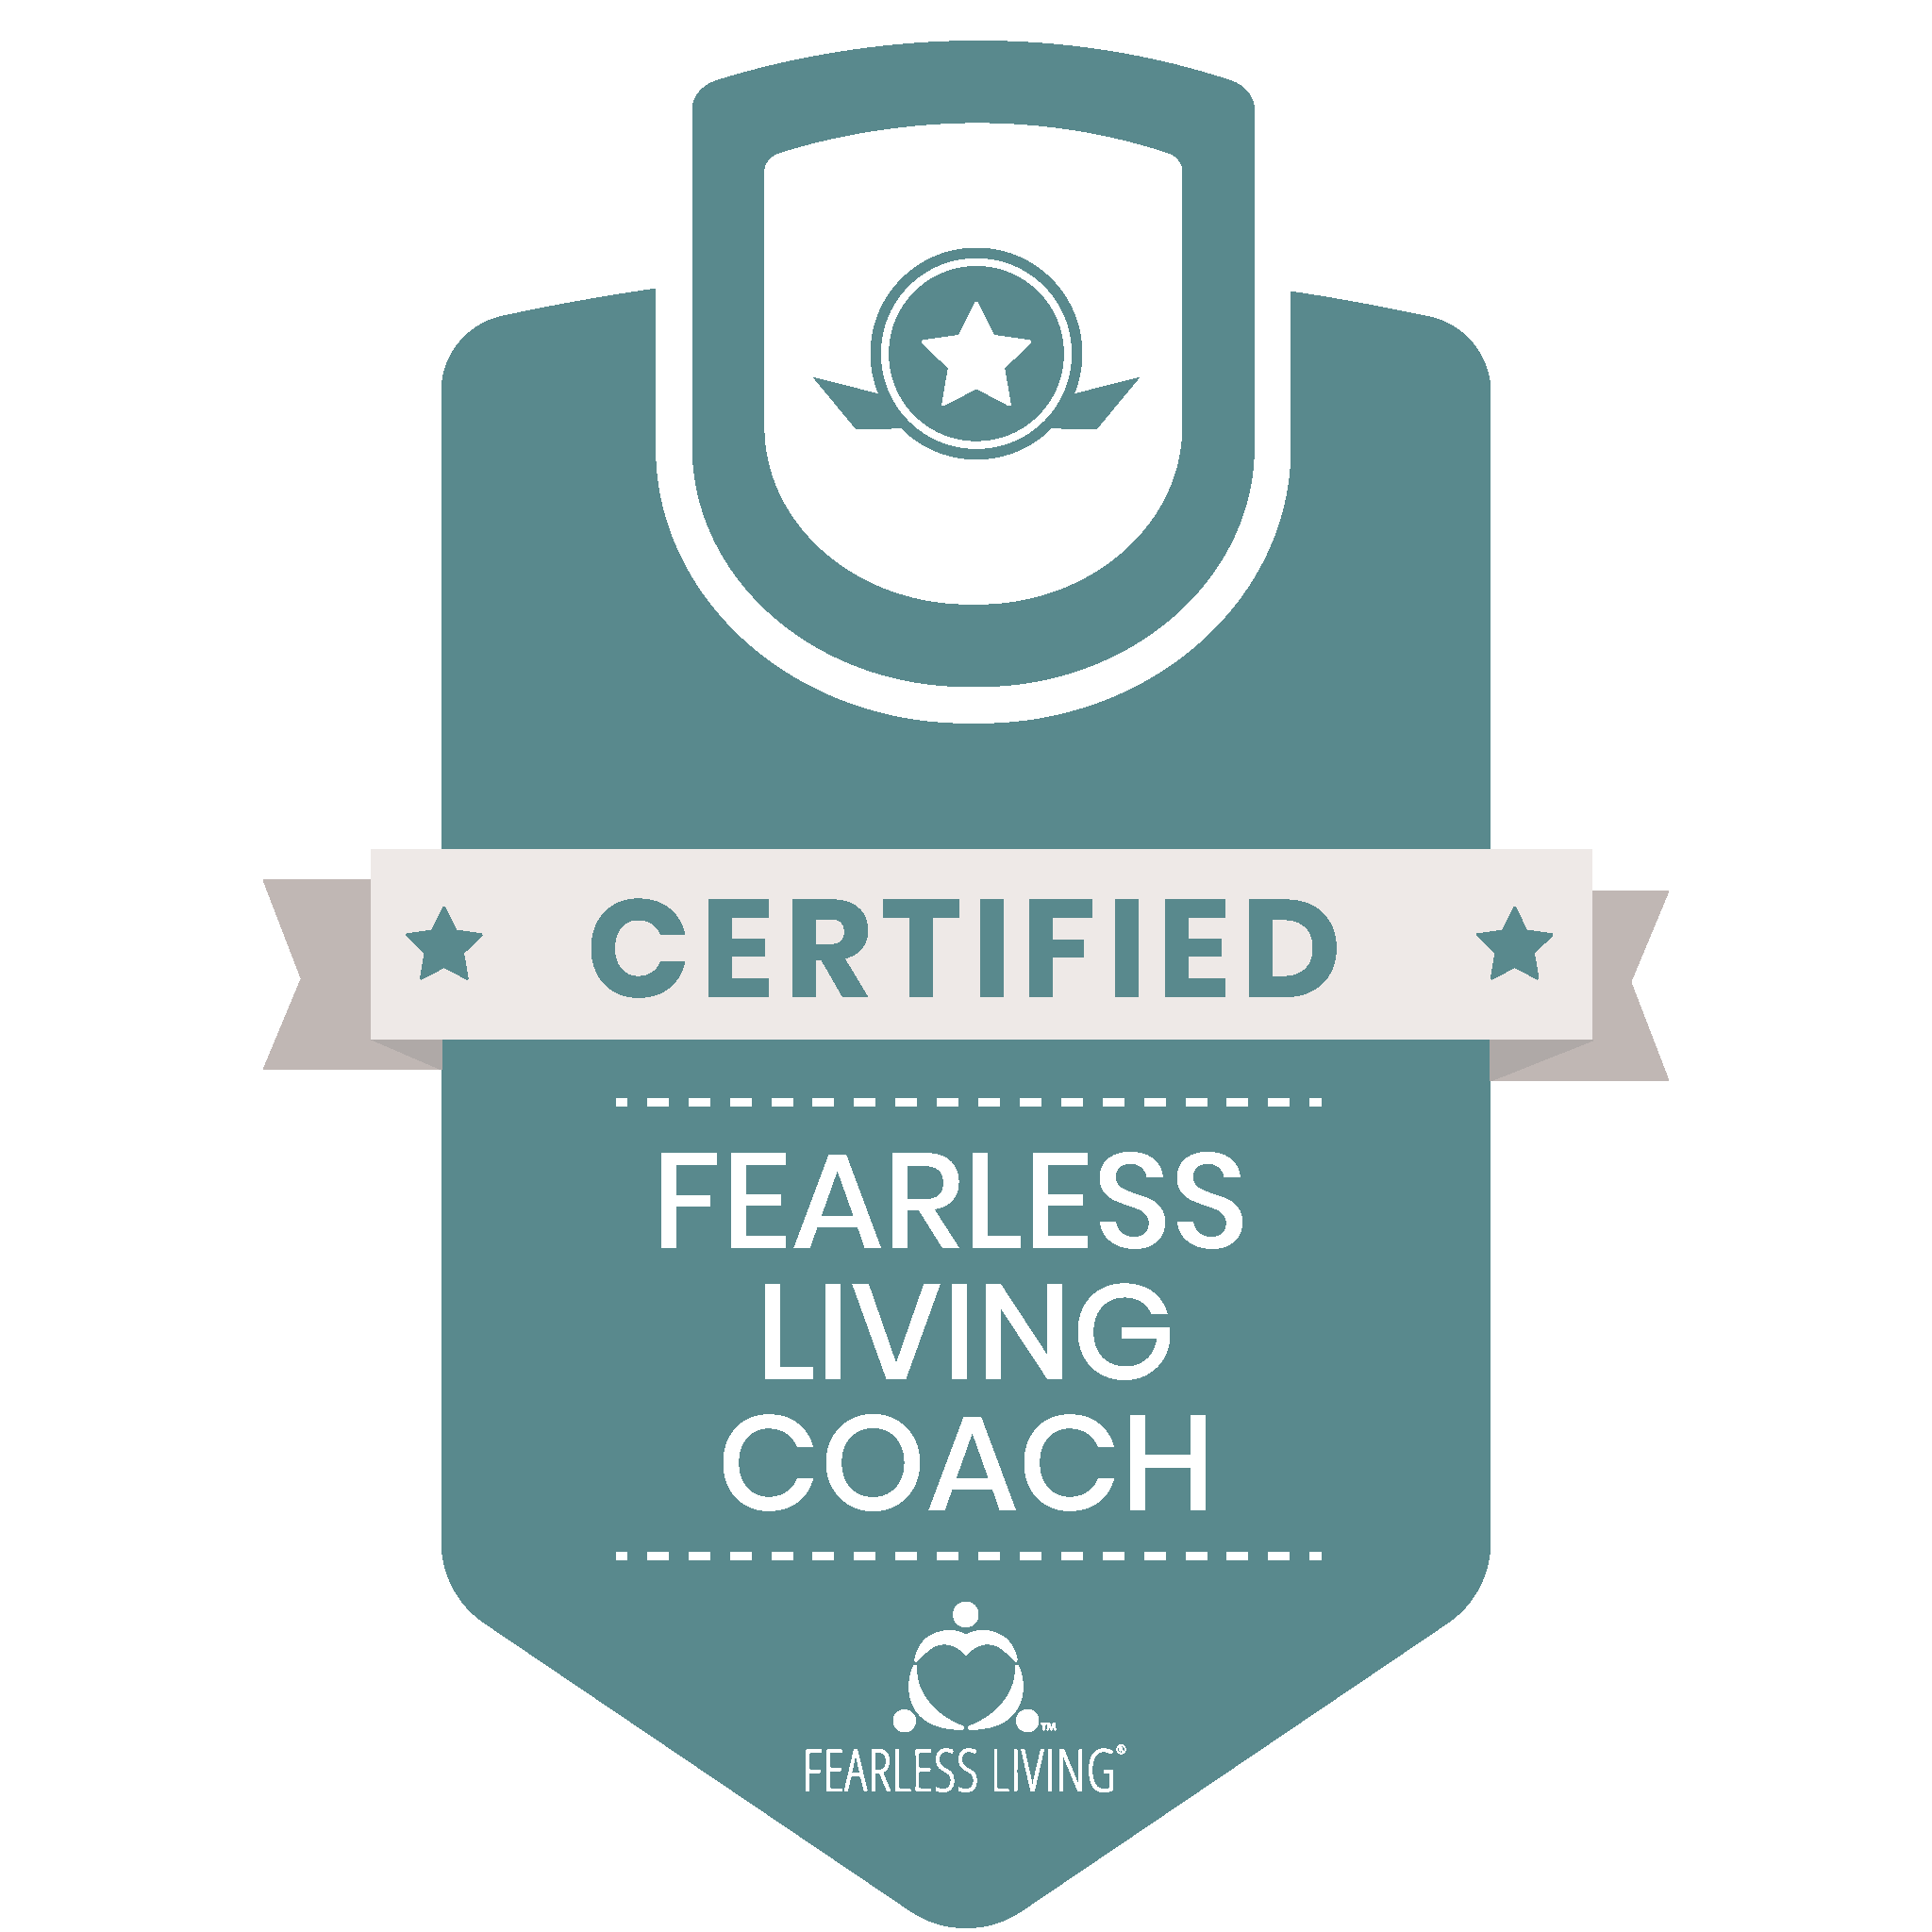 Certified Fearless Living Coach (CFLC)